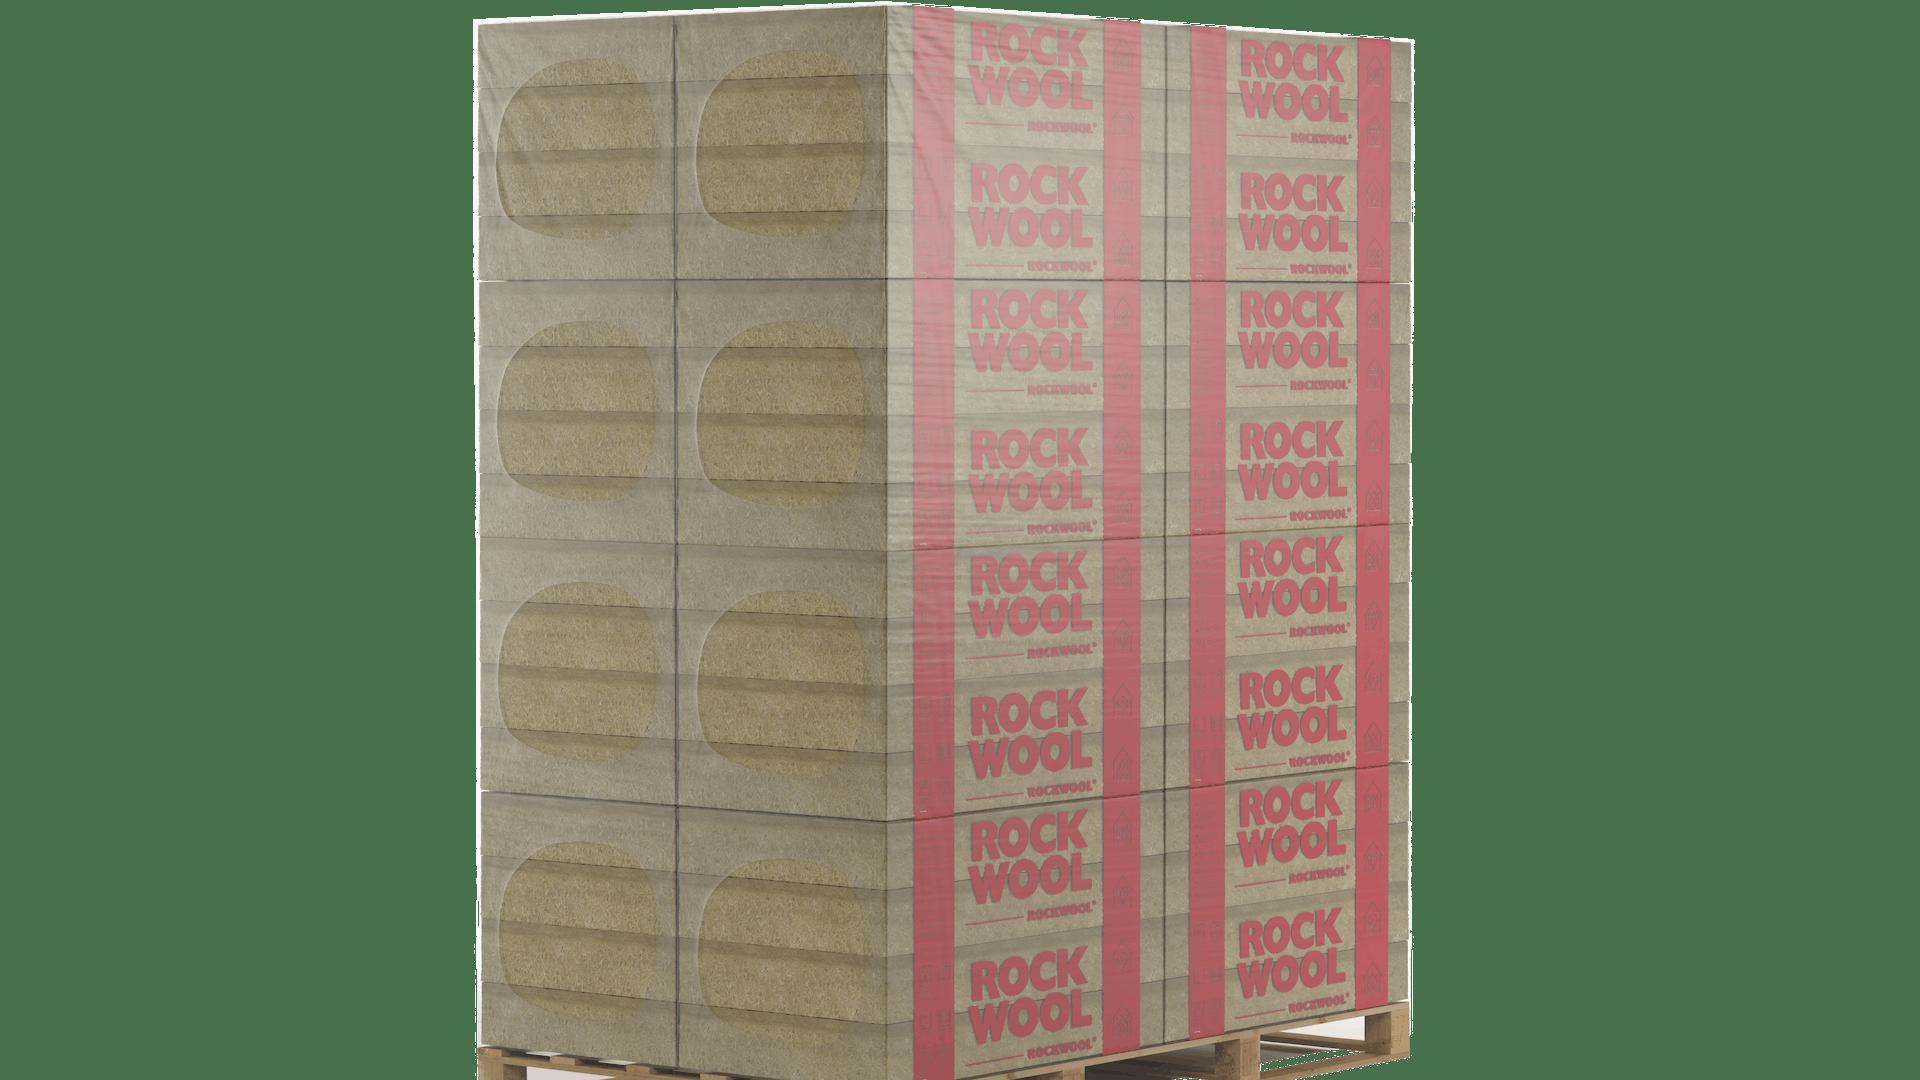 STALROCK MAX, slabs, pallet, ventilated facades, external insulation